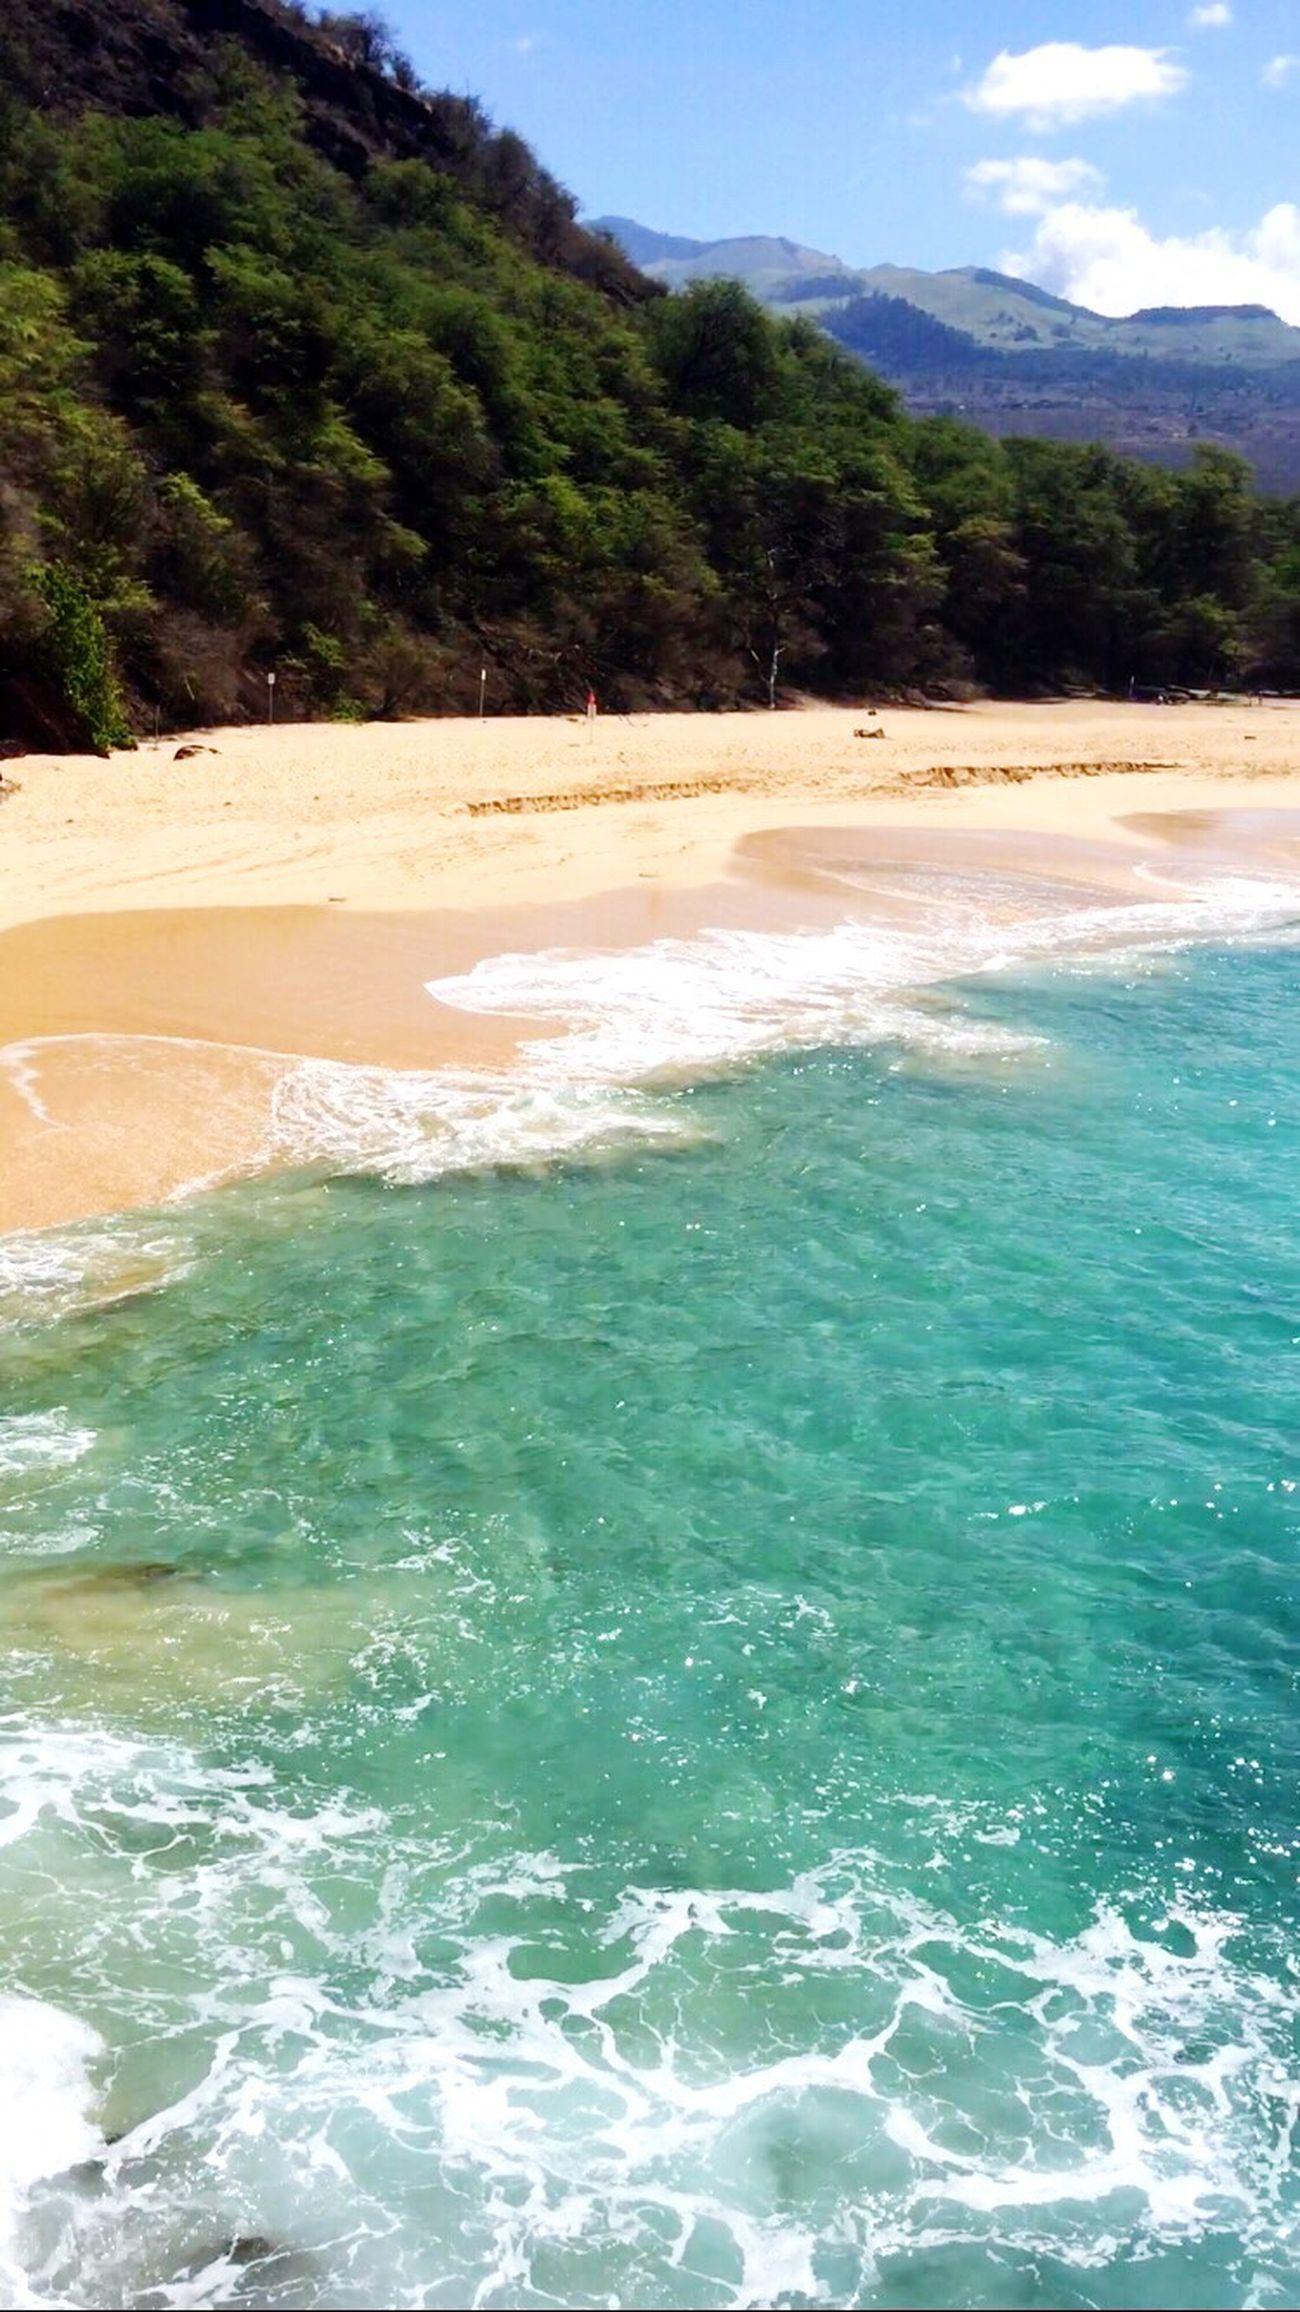 The most magical beach out there✨🐚 Clarity Clear Glass Magical Bigbeach Aqua Dreamy Maui